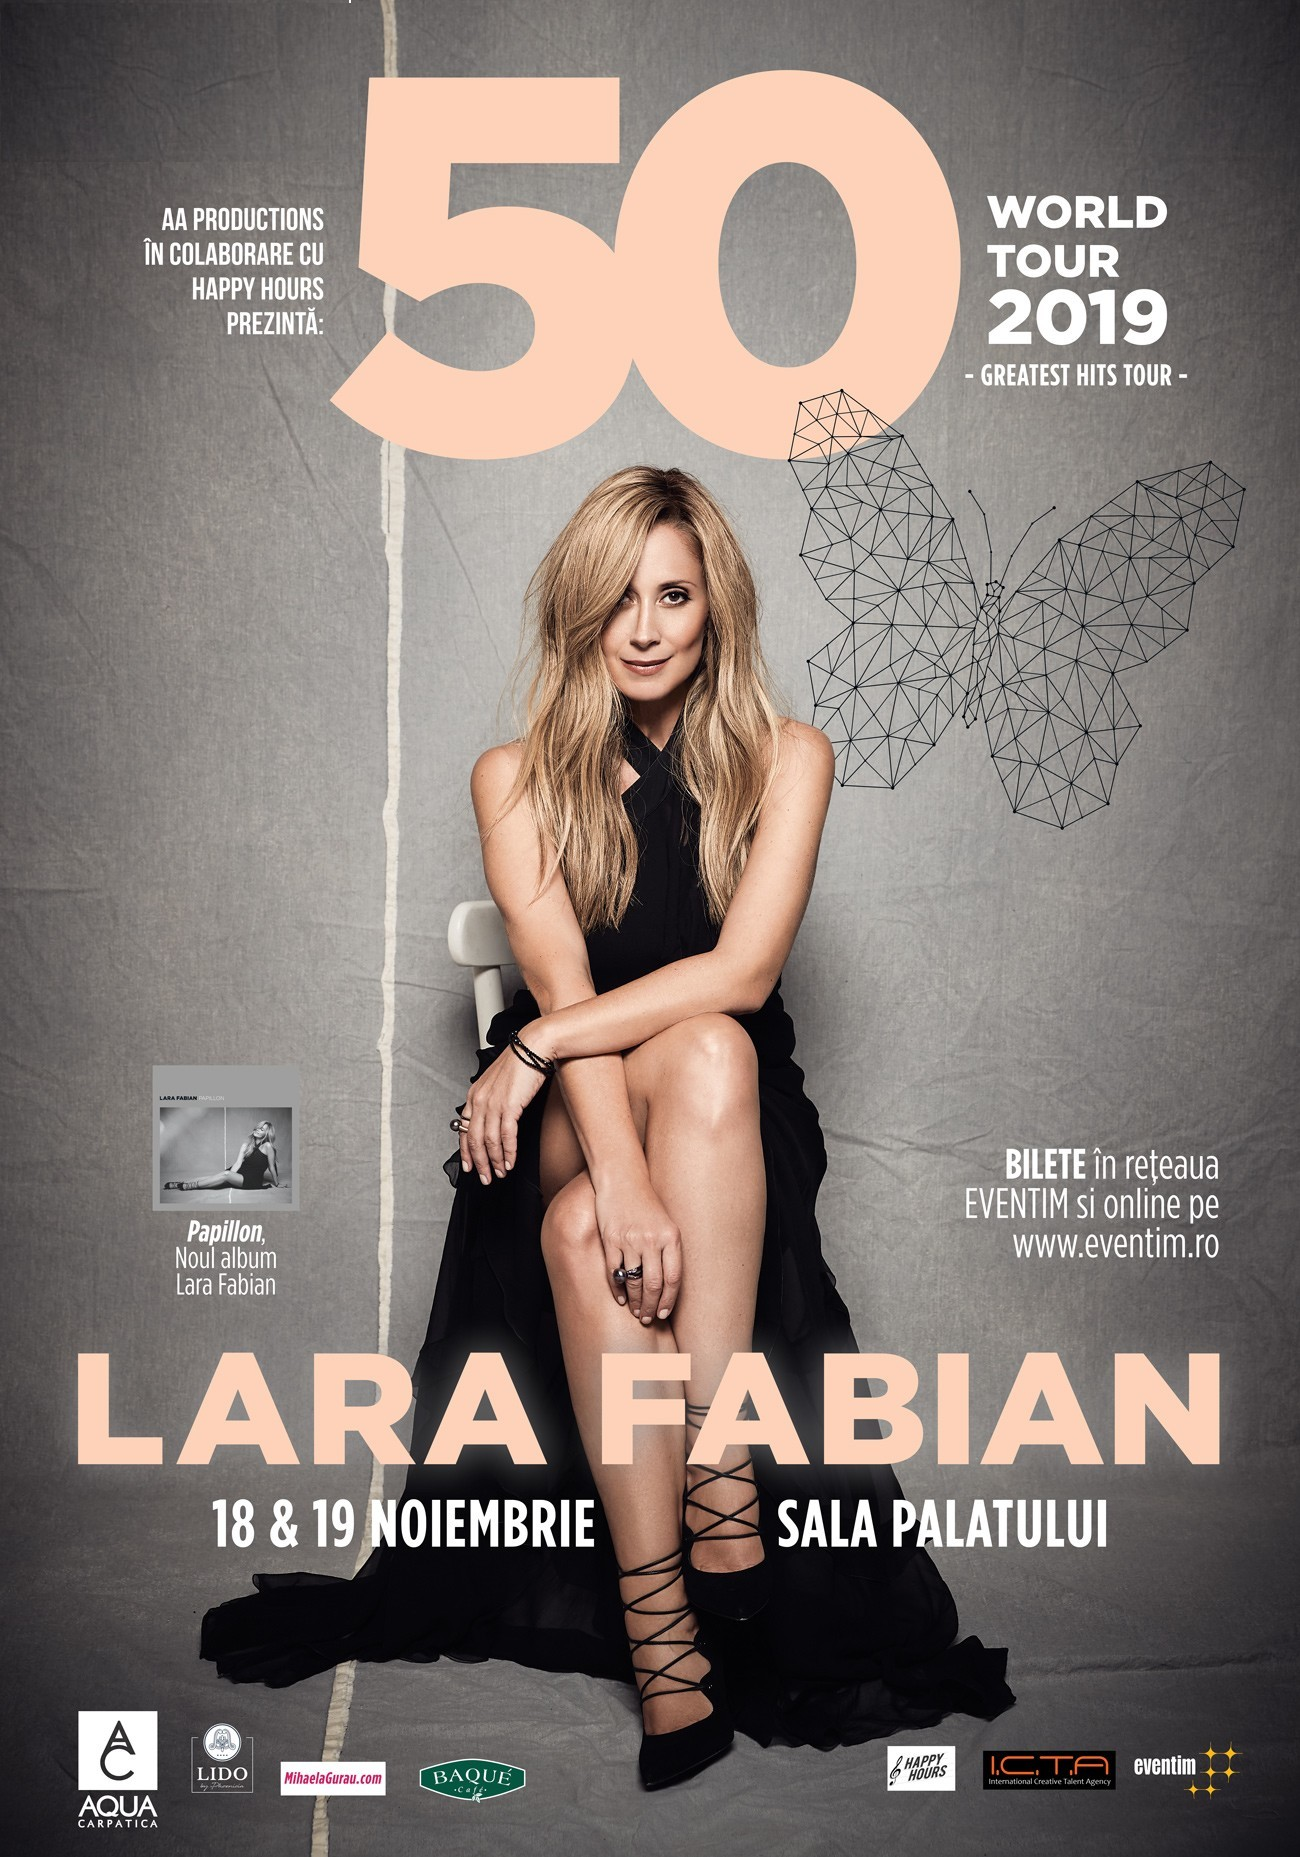 Lara Fabian revine in Romania in luna Noiembrie